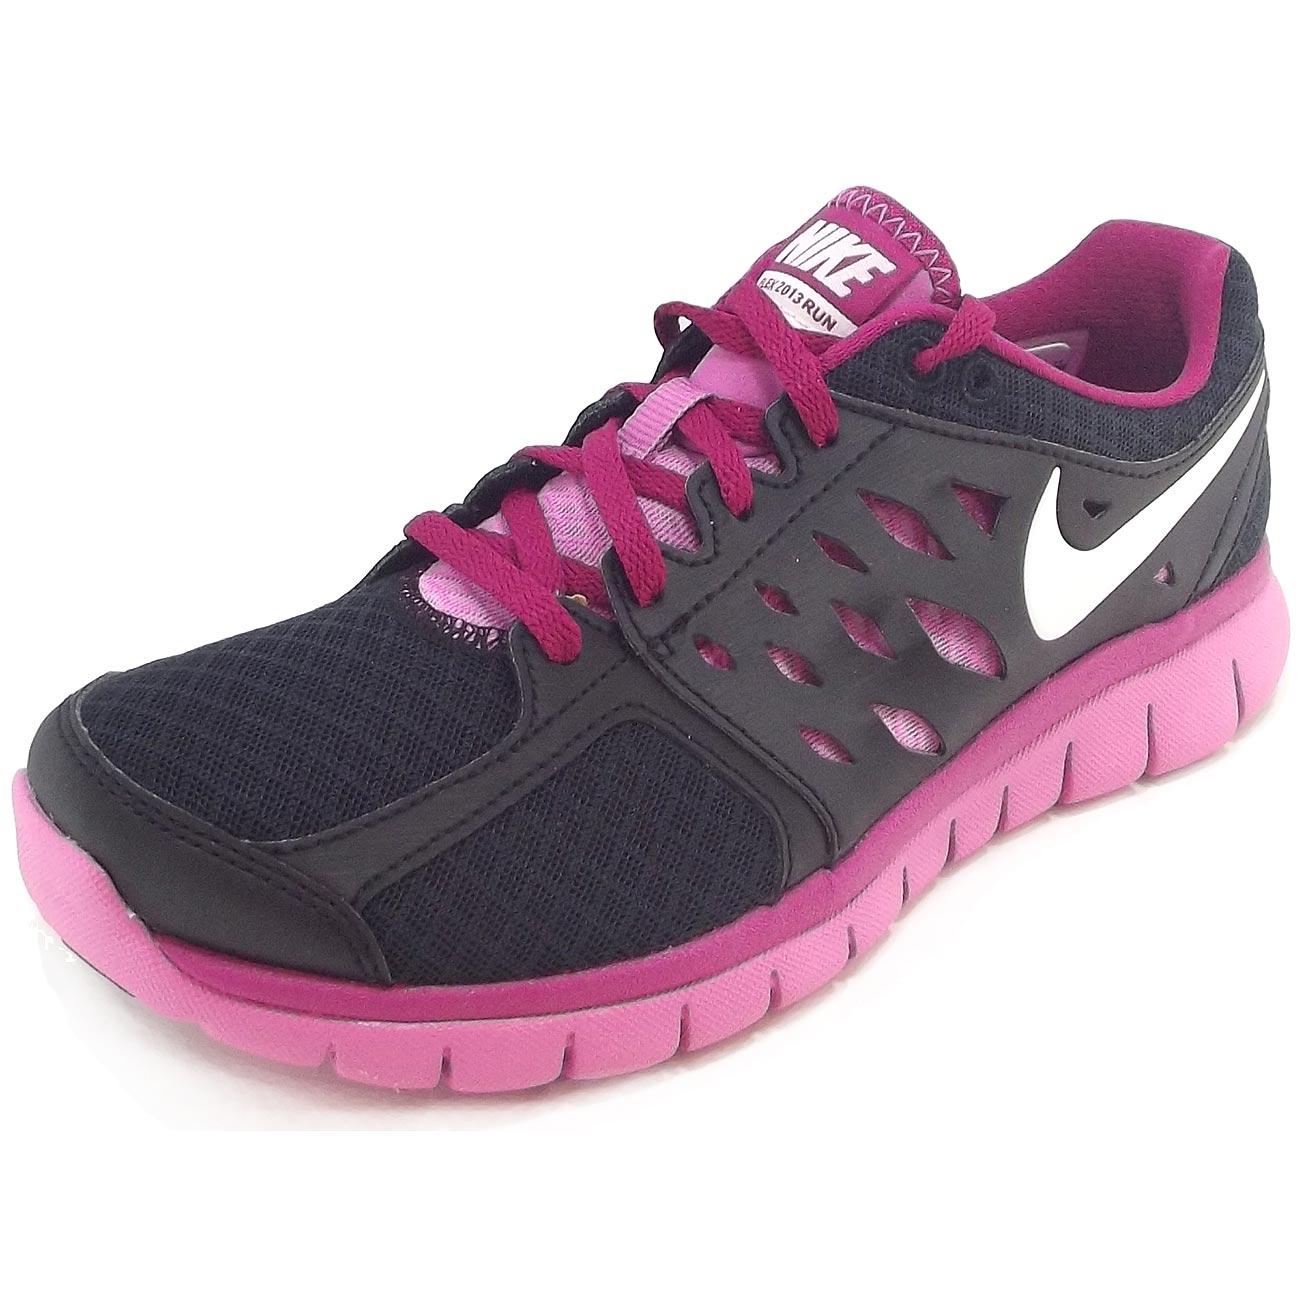 Nike Flex 2013 Run Women blackviolet | Flux Online